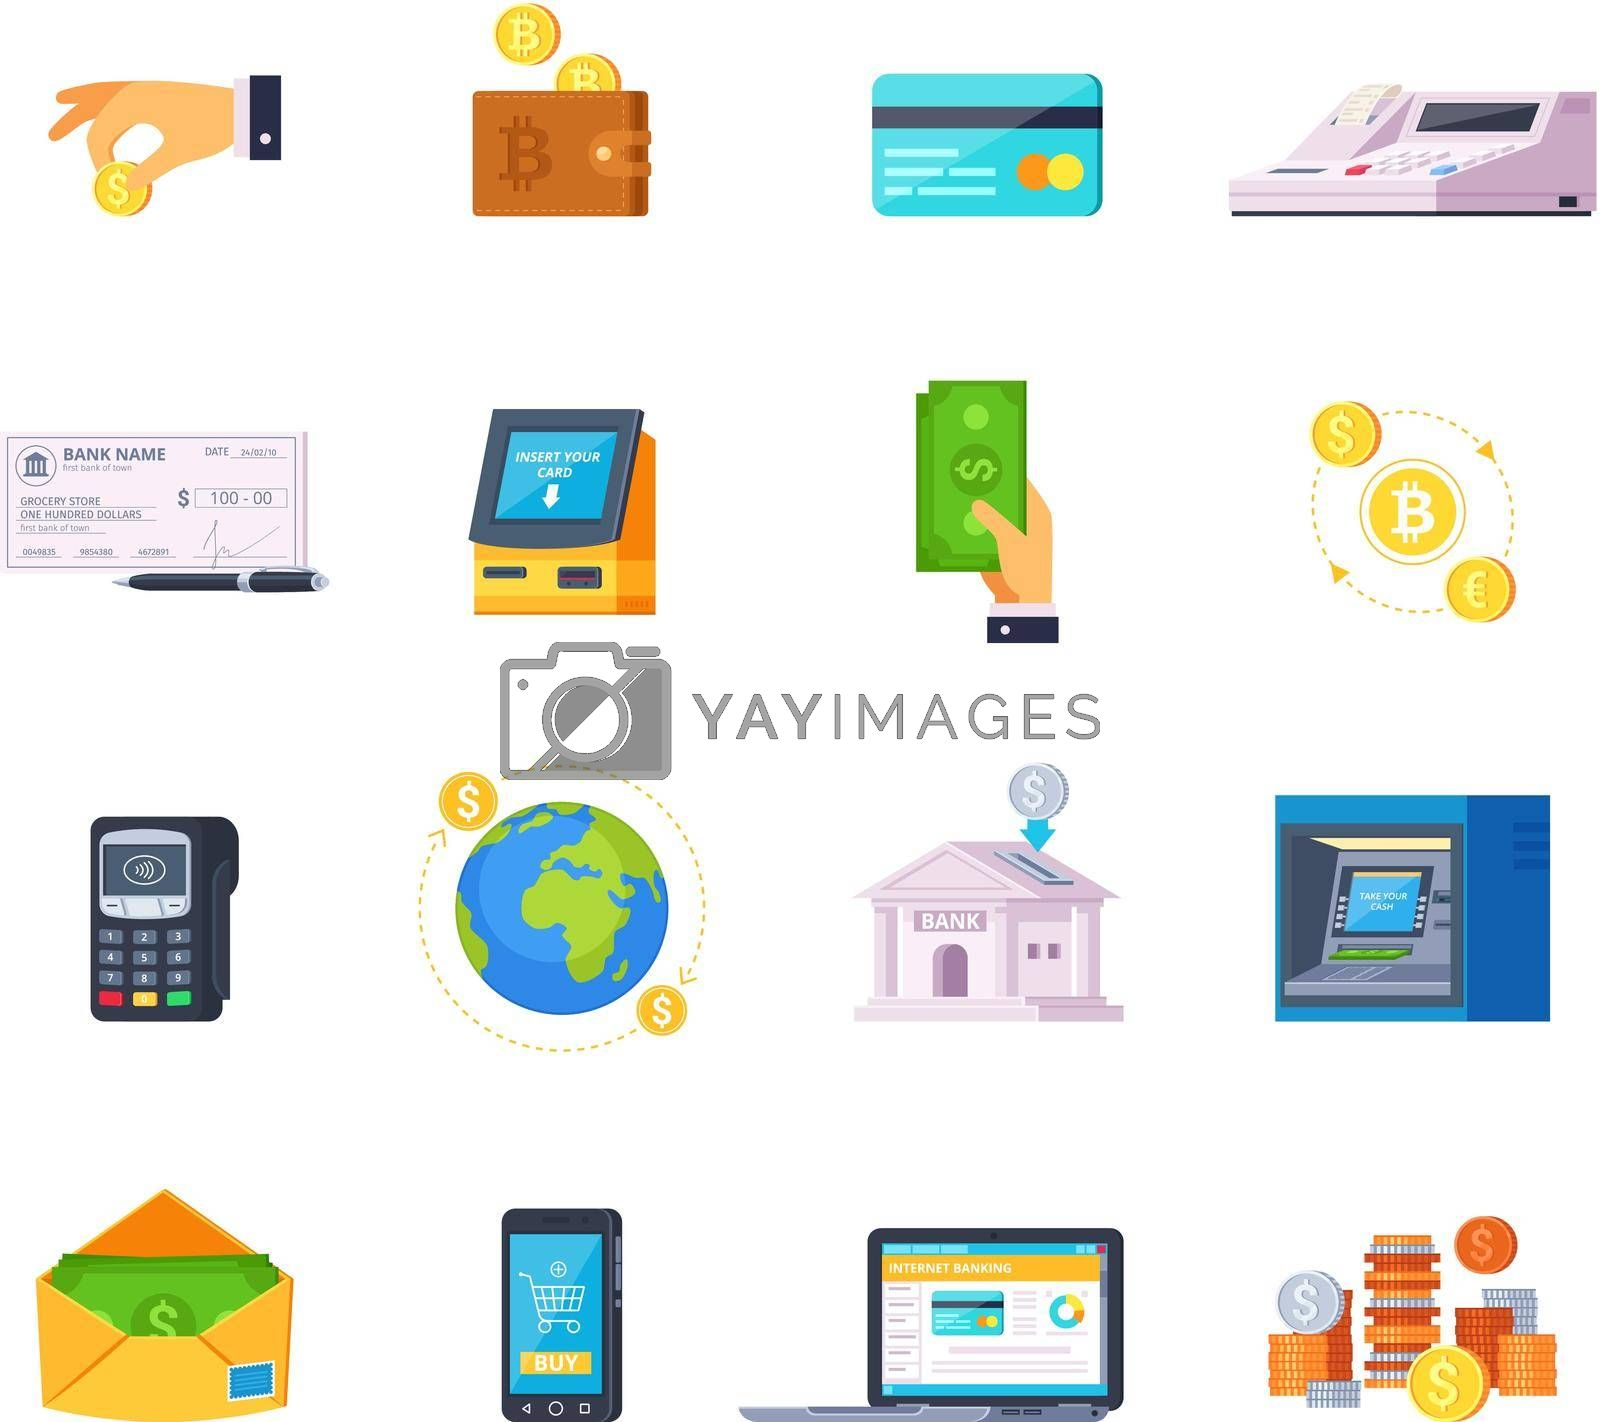 Royalty free image of Financial Technology Icons by mstjahanara